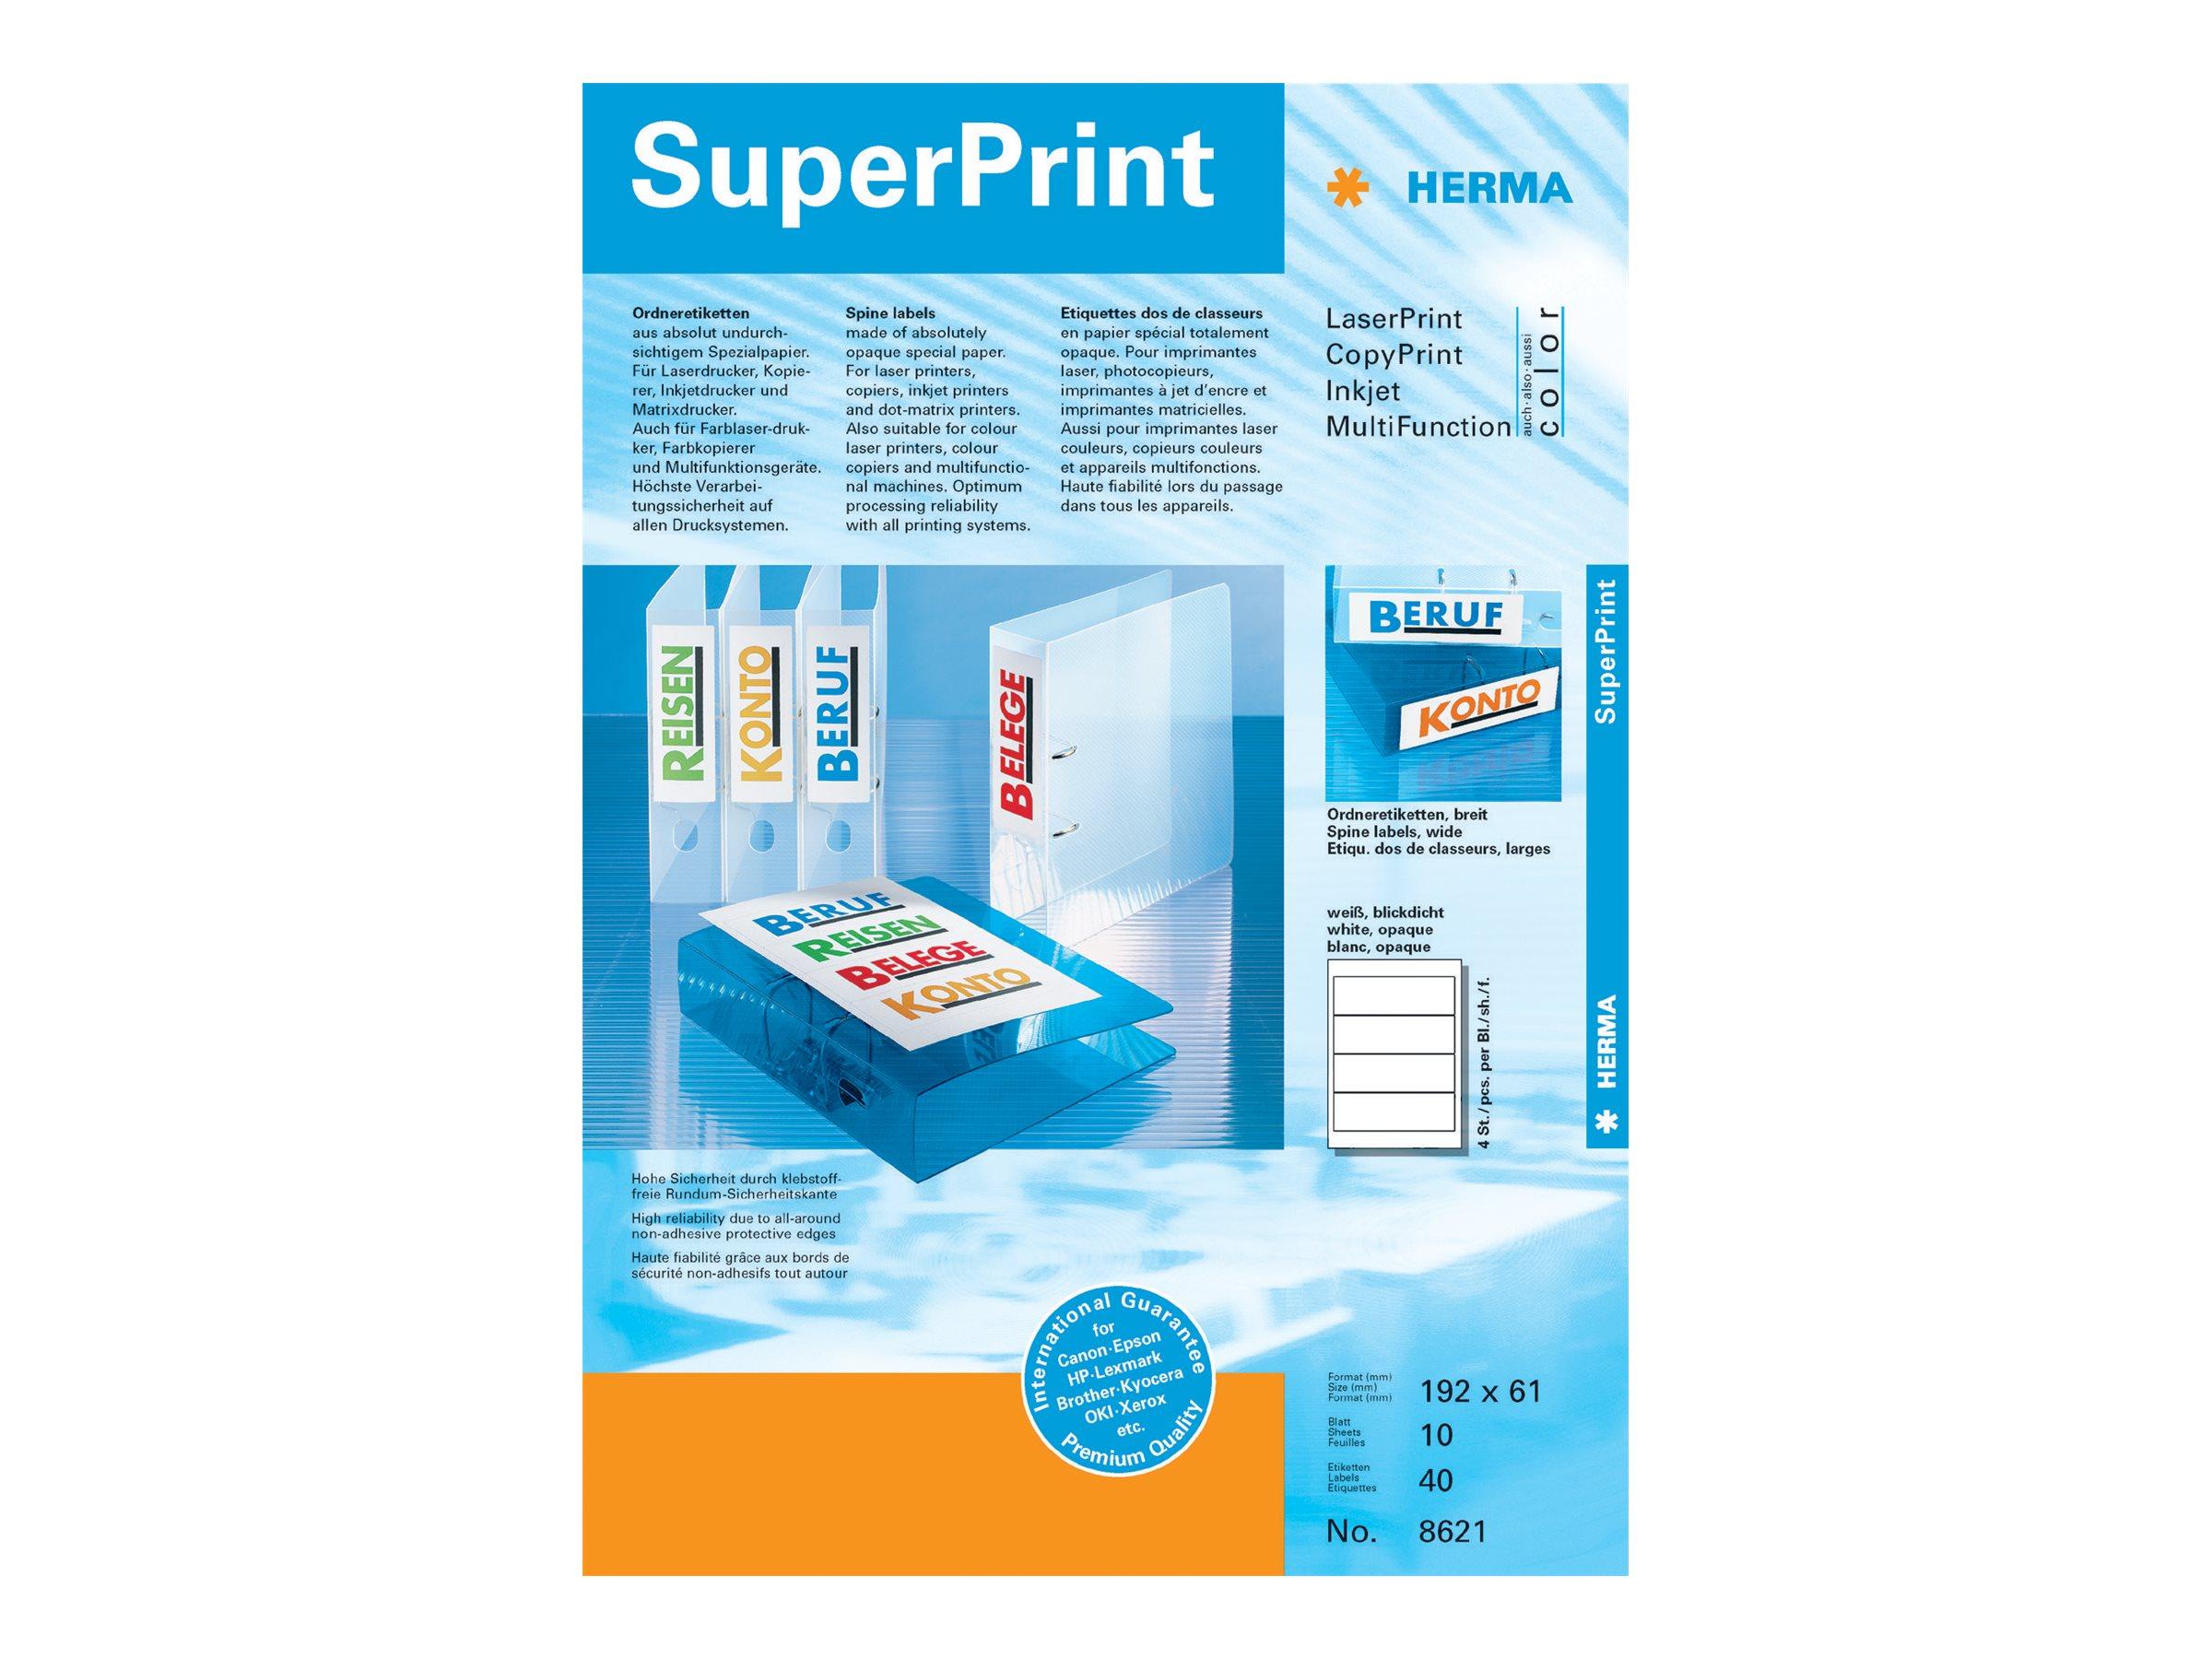 HERMA Special - Papier - matt - permanent selbstklebend - weiß - 192 x 61 mm 40 Etikett(en) (10 Bogen x 4)